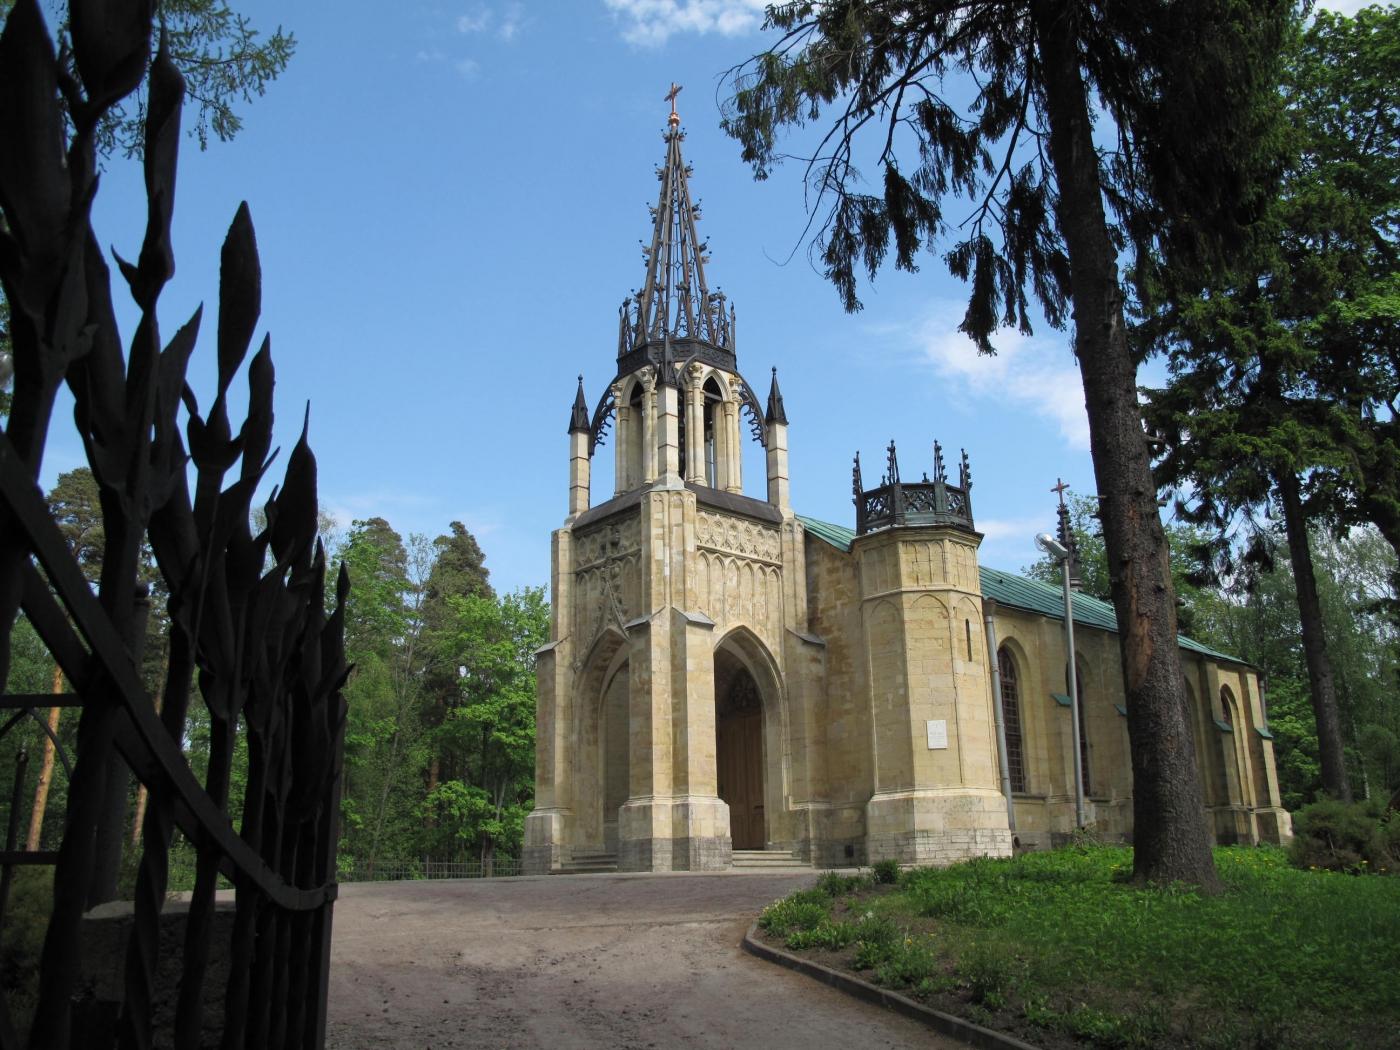 Церковь Святых апостолов Петра и Павла. Фото: shuvalovopark.ru